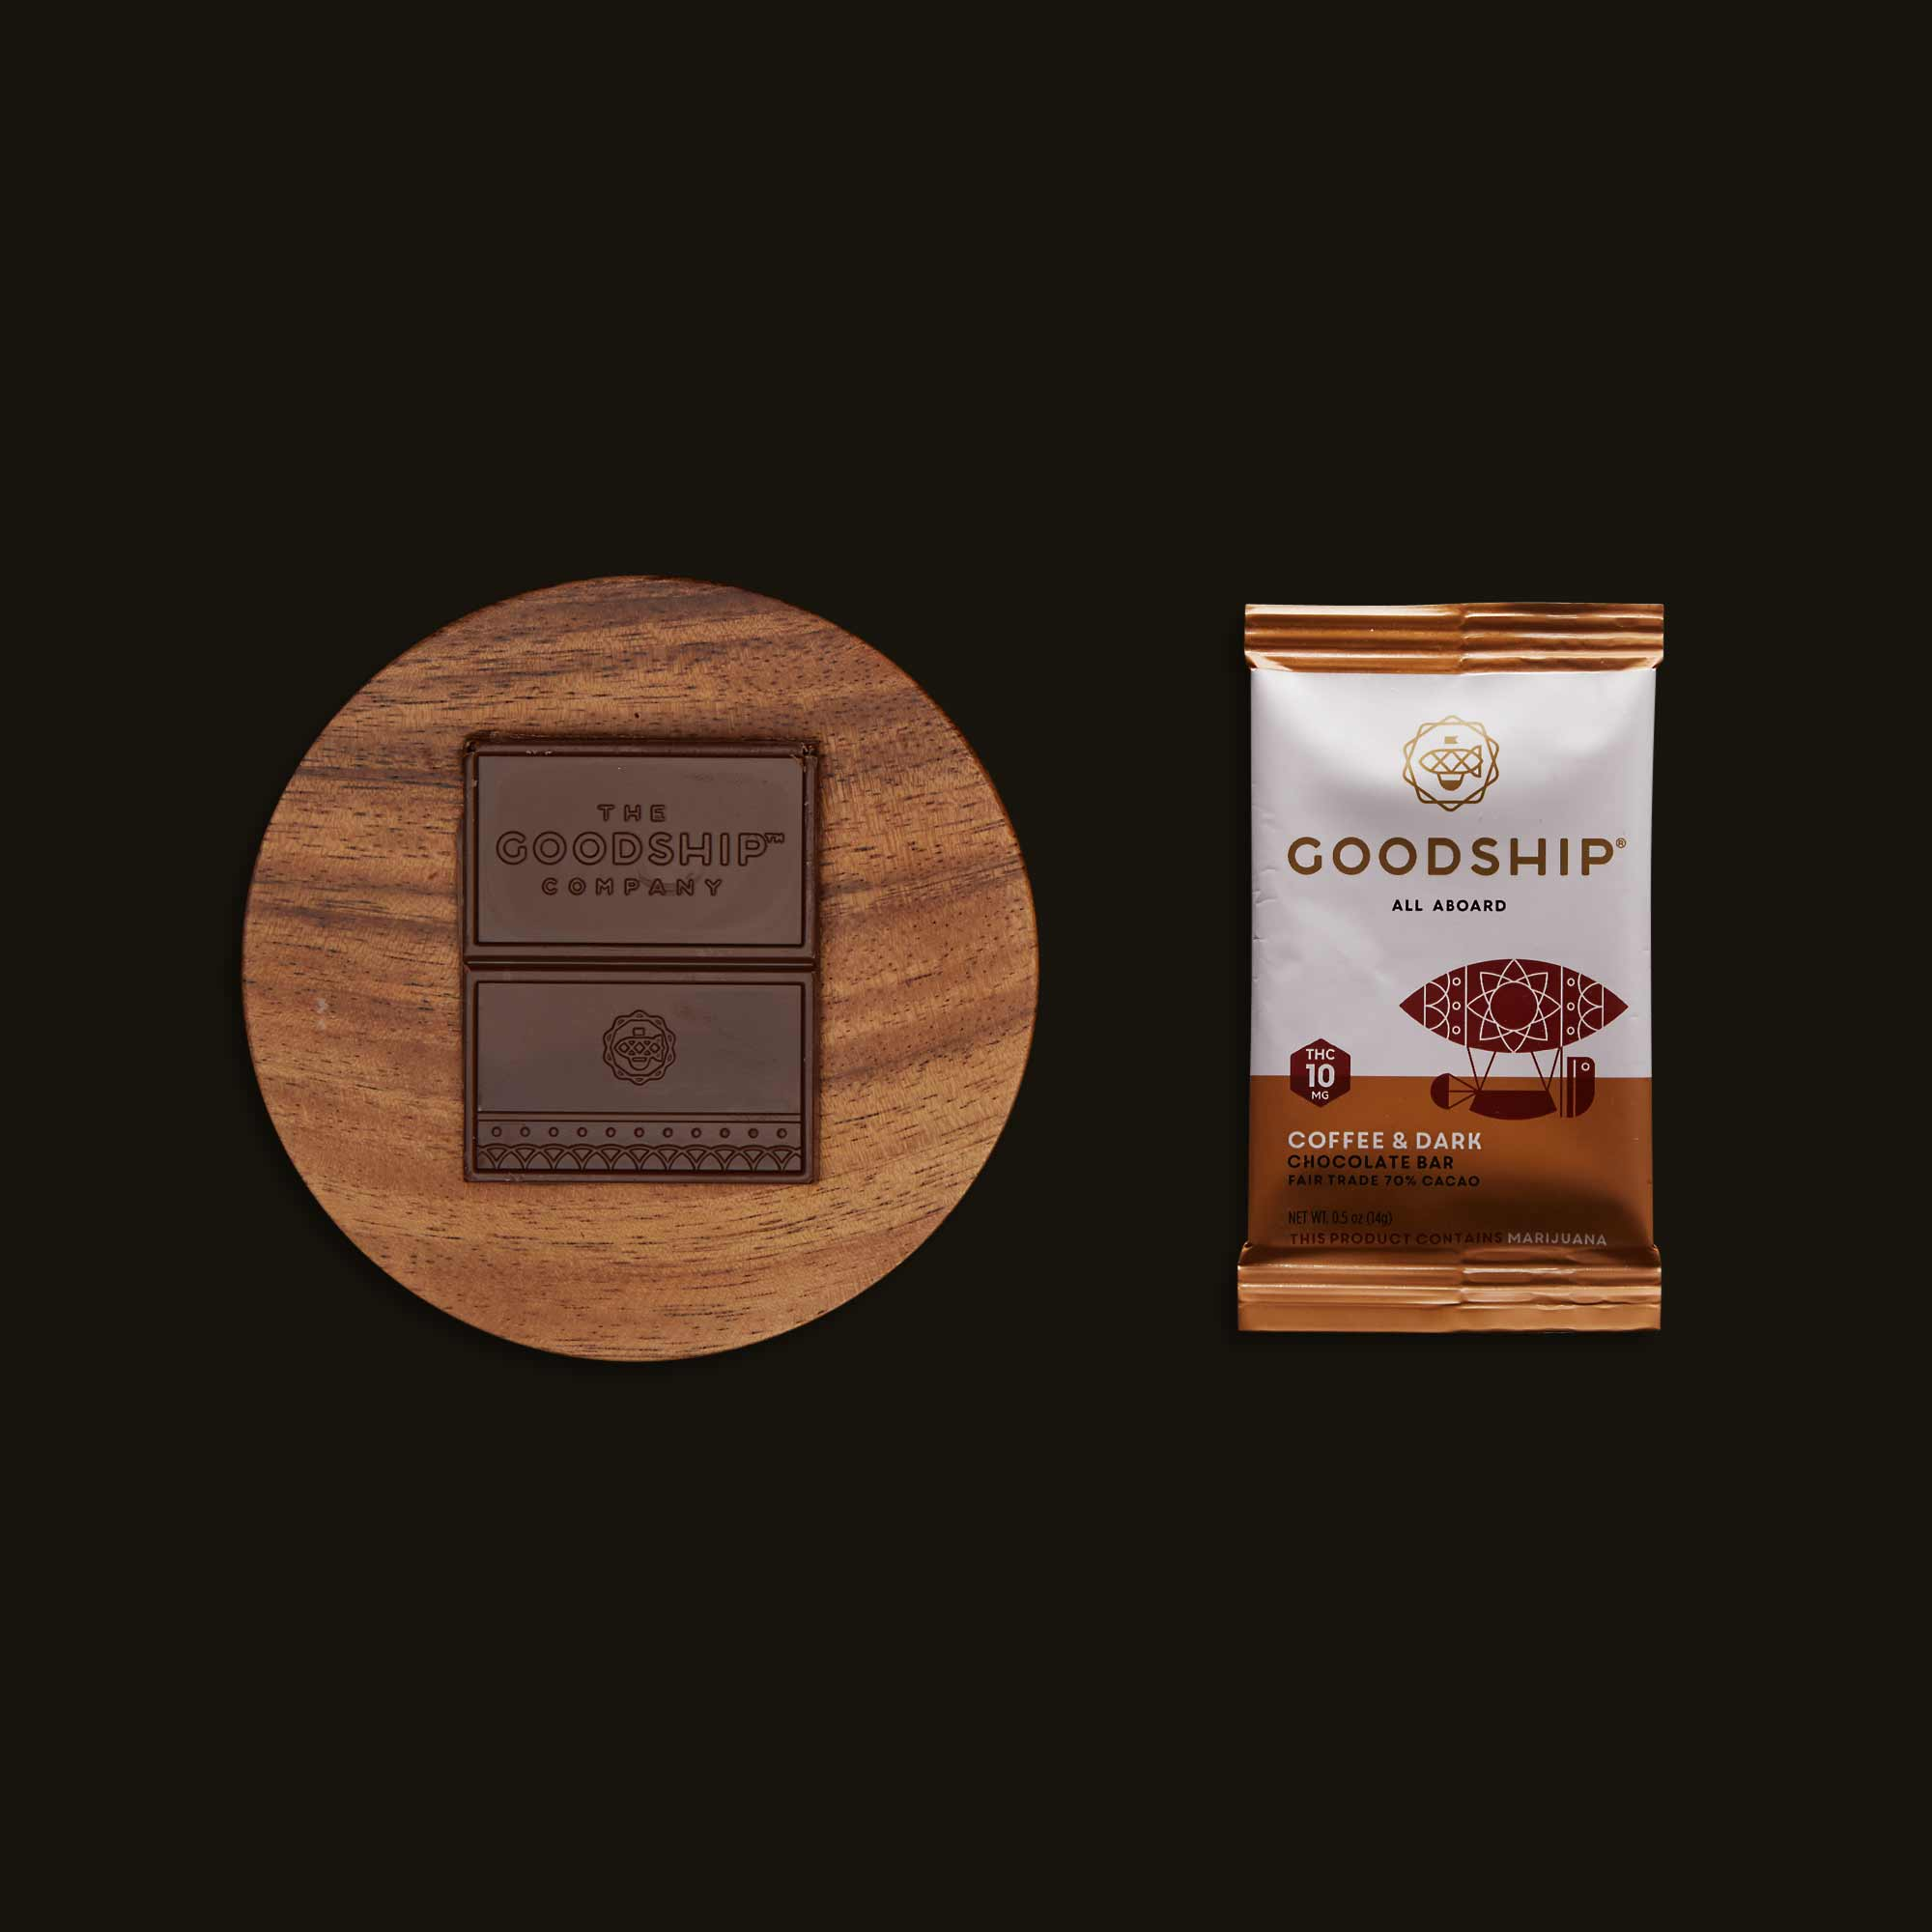 Goodship Coffee & Dark Chocolate Bar